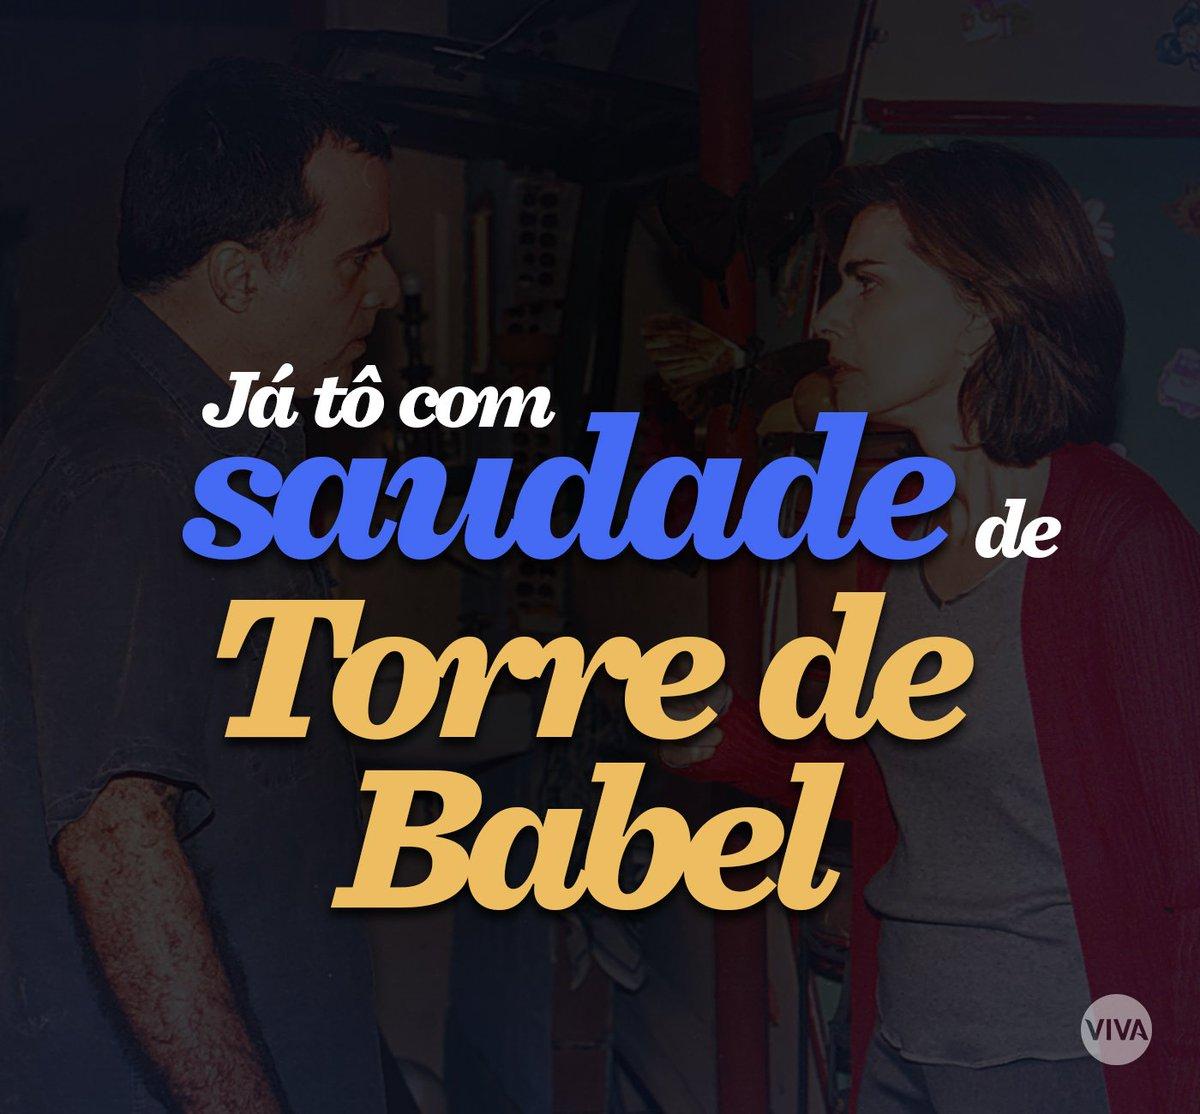 #TorreDeBabelNoVIVA